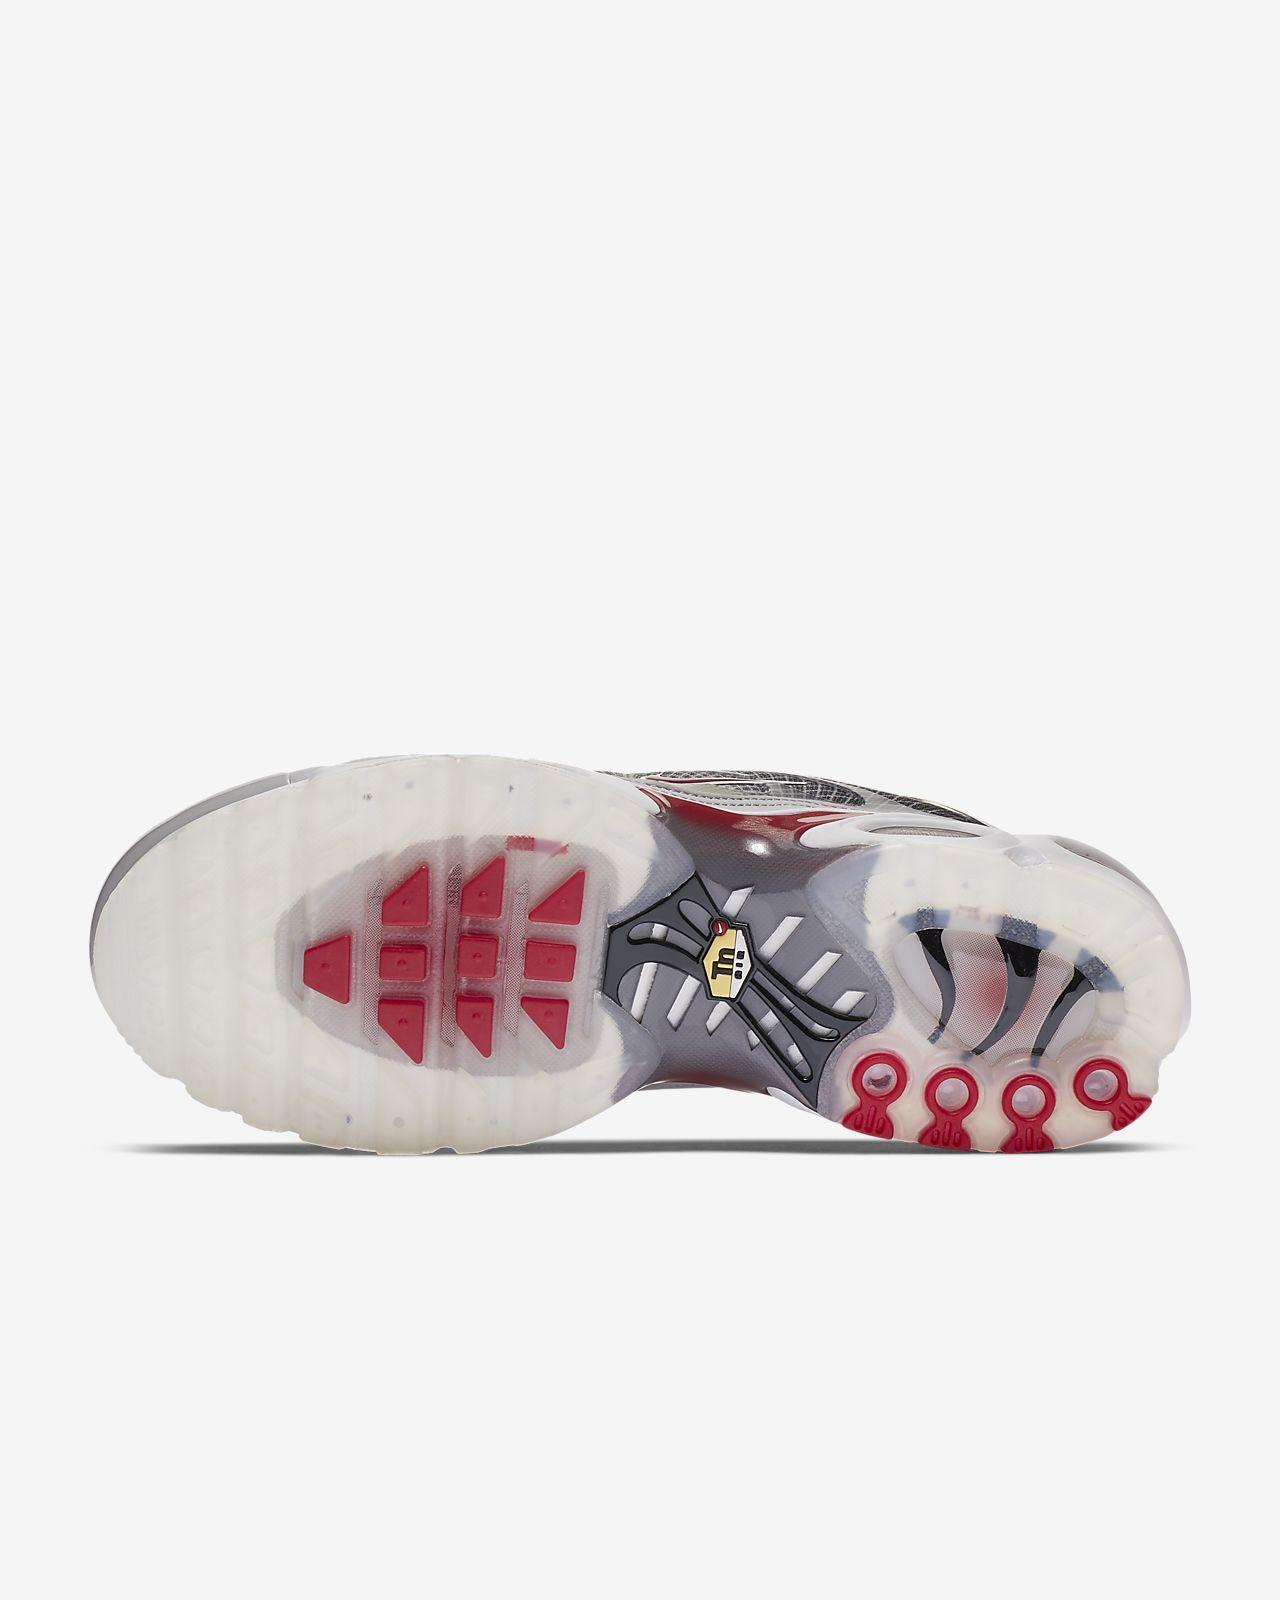 BUY Nike Air Max Plus Neutral Grey Varsity Red | Kixify